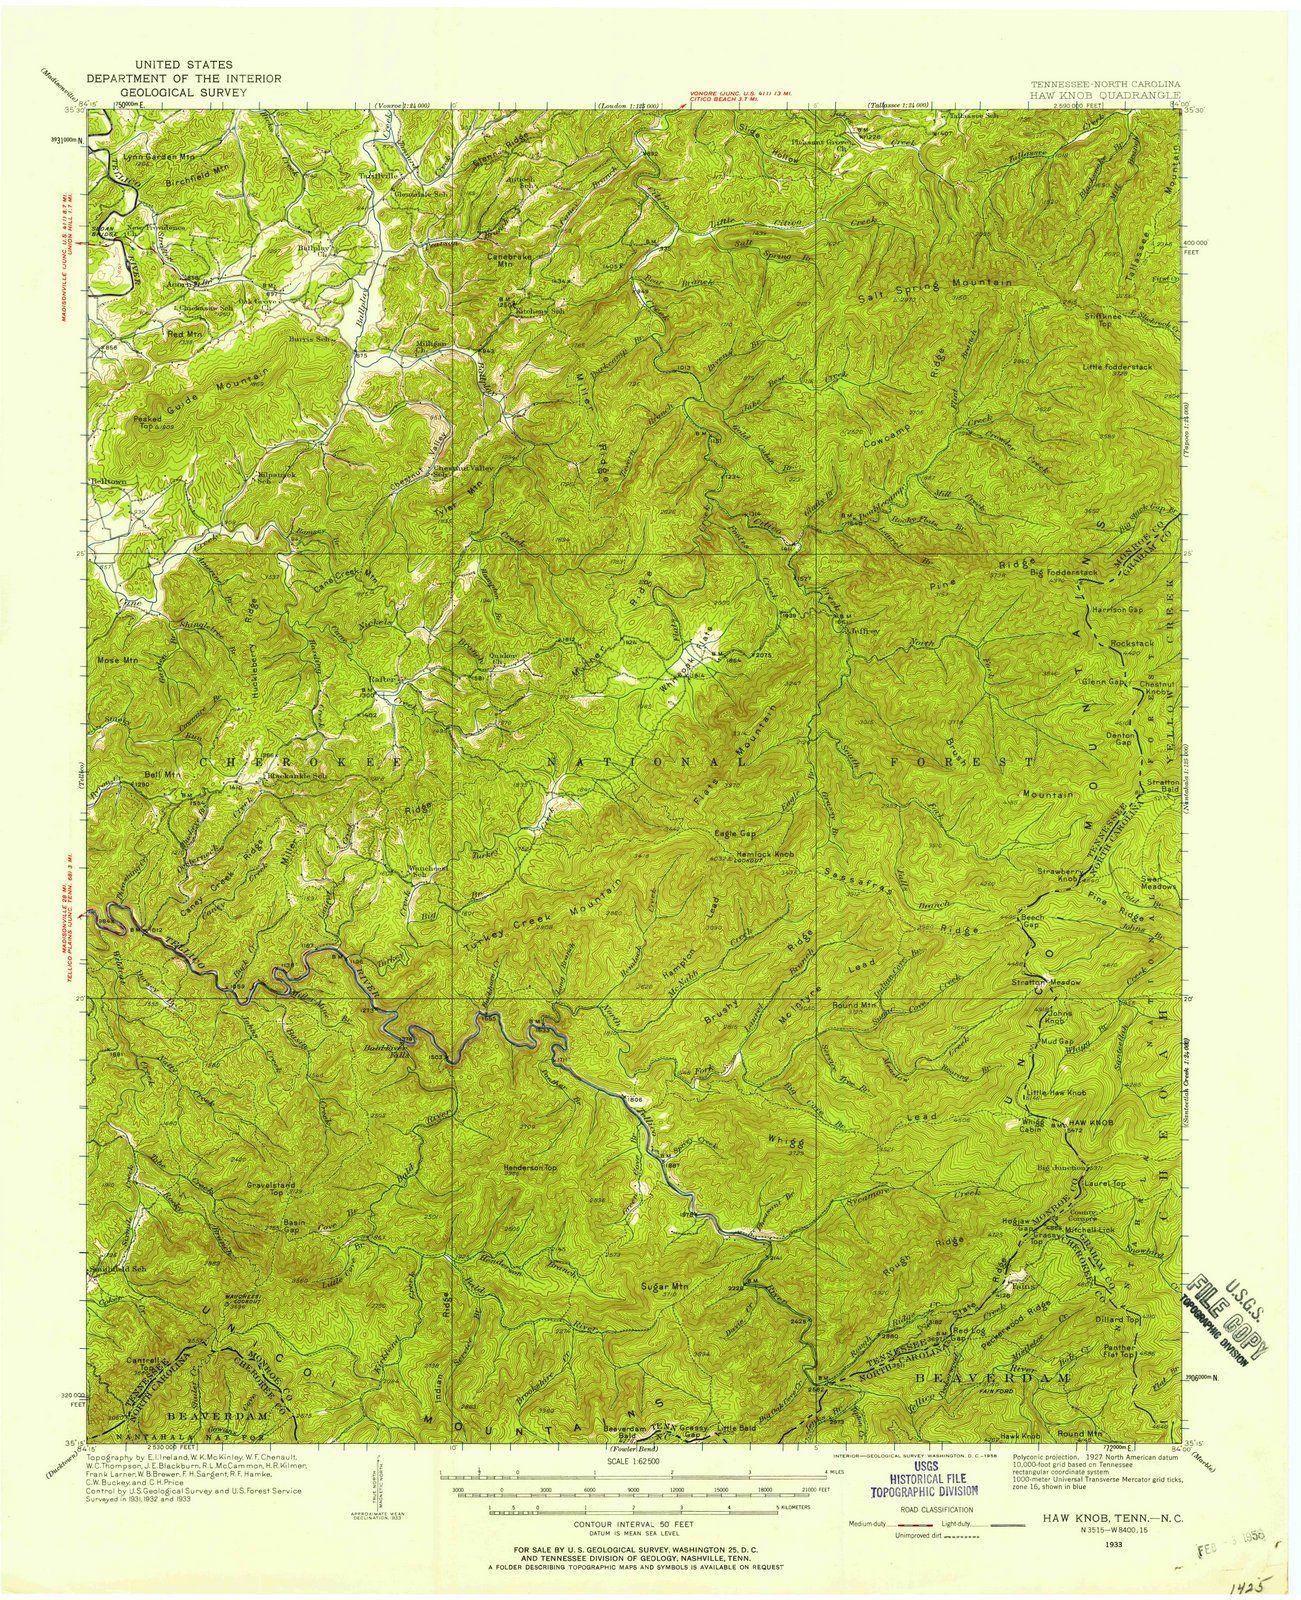 <p>1933 Haw Knob, TN - Tennessee - USGS Topographic Map</p>